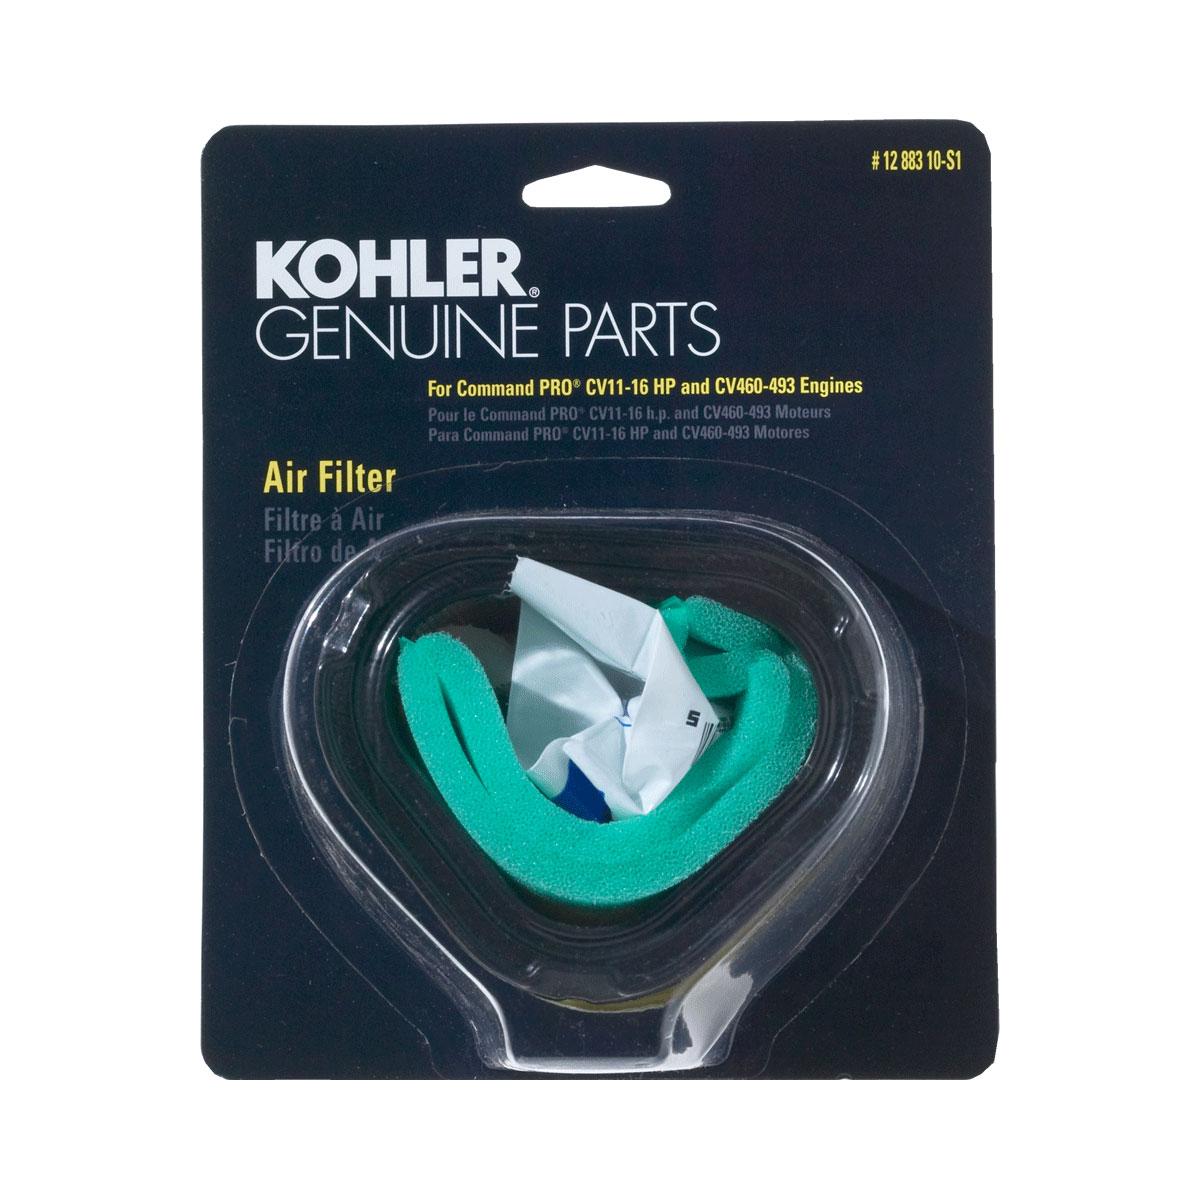 Genuine OEM Kohler 16 083 05-S Pre-Cleaner Element Air Filter